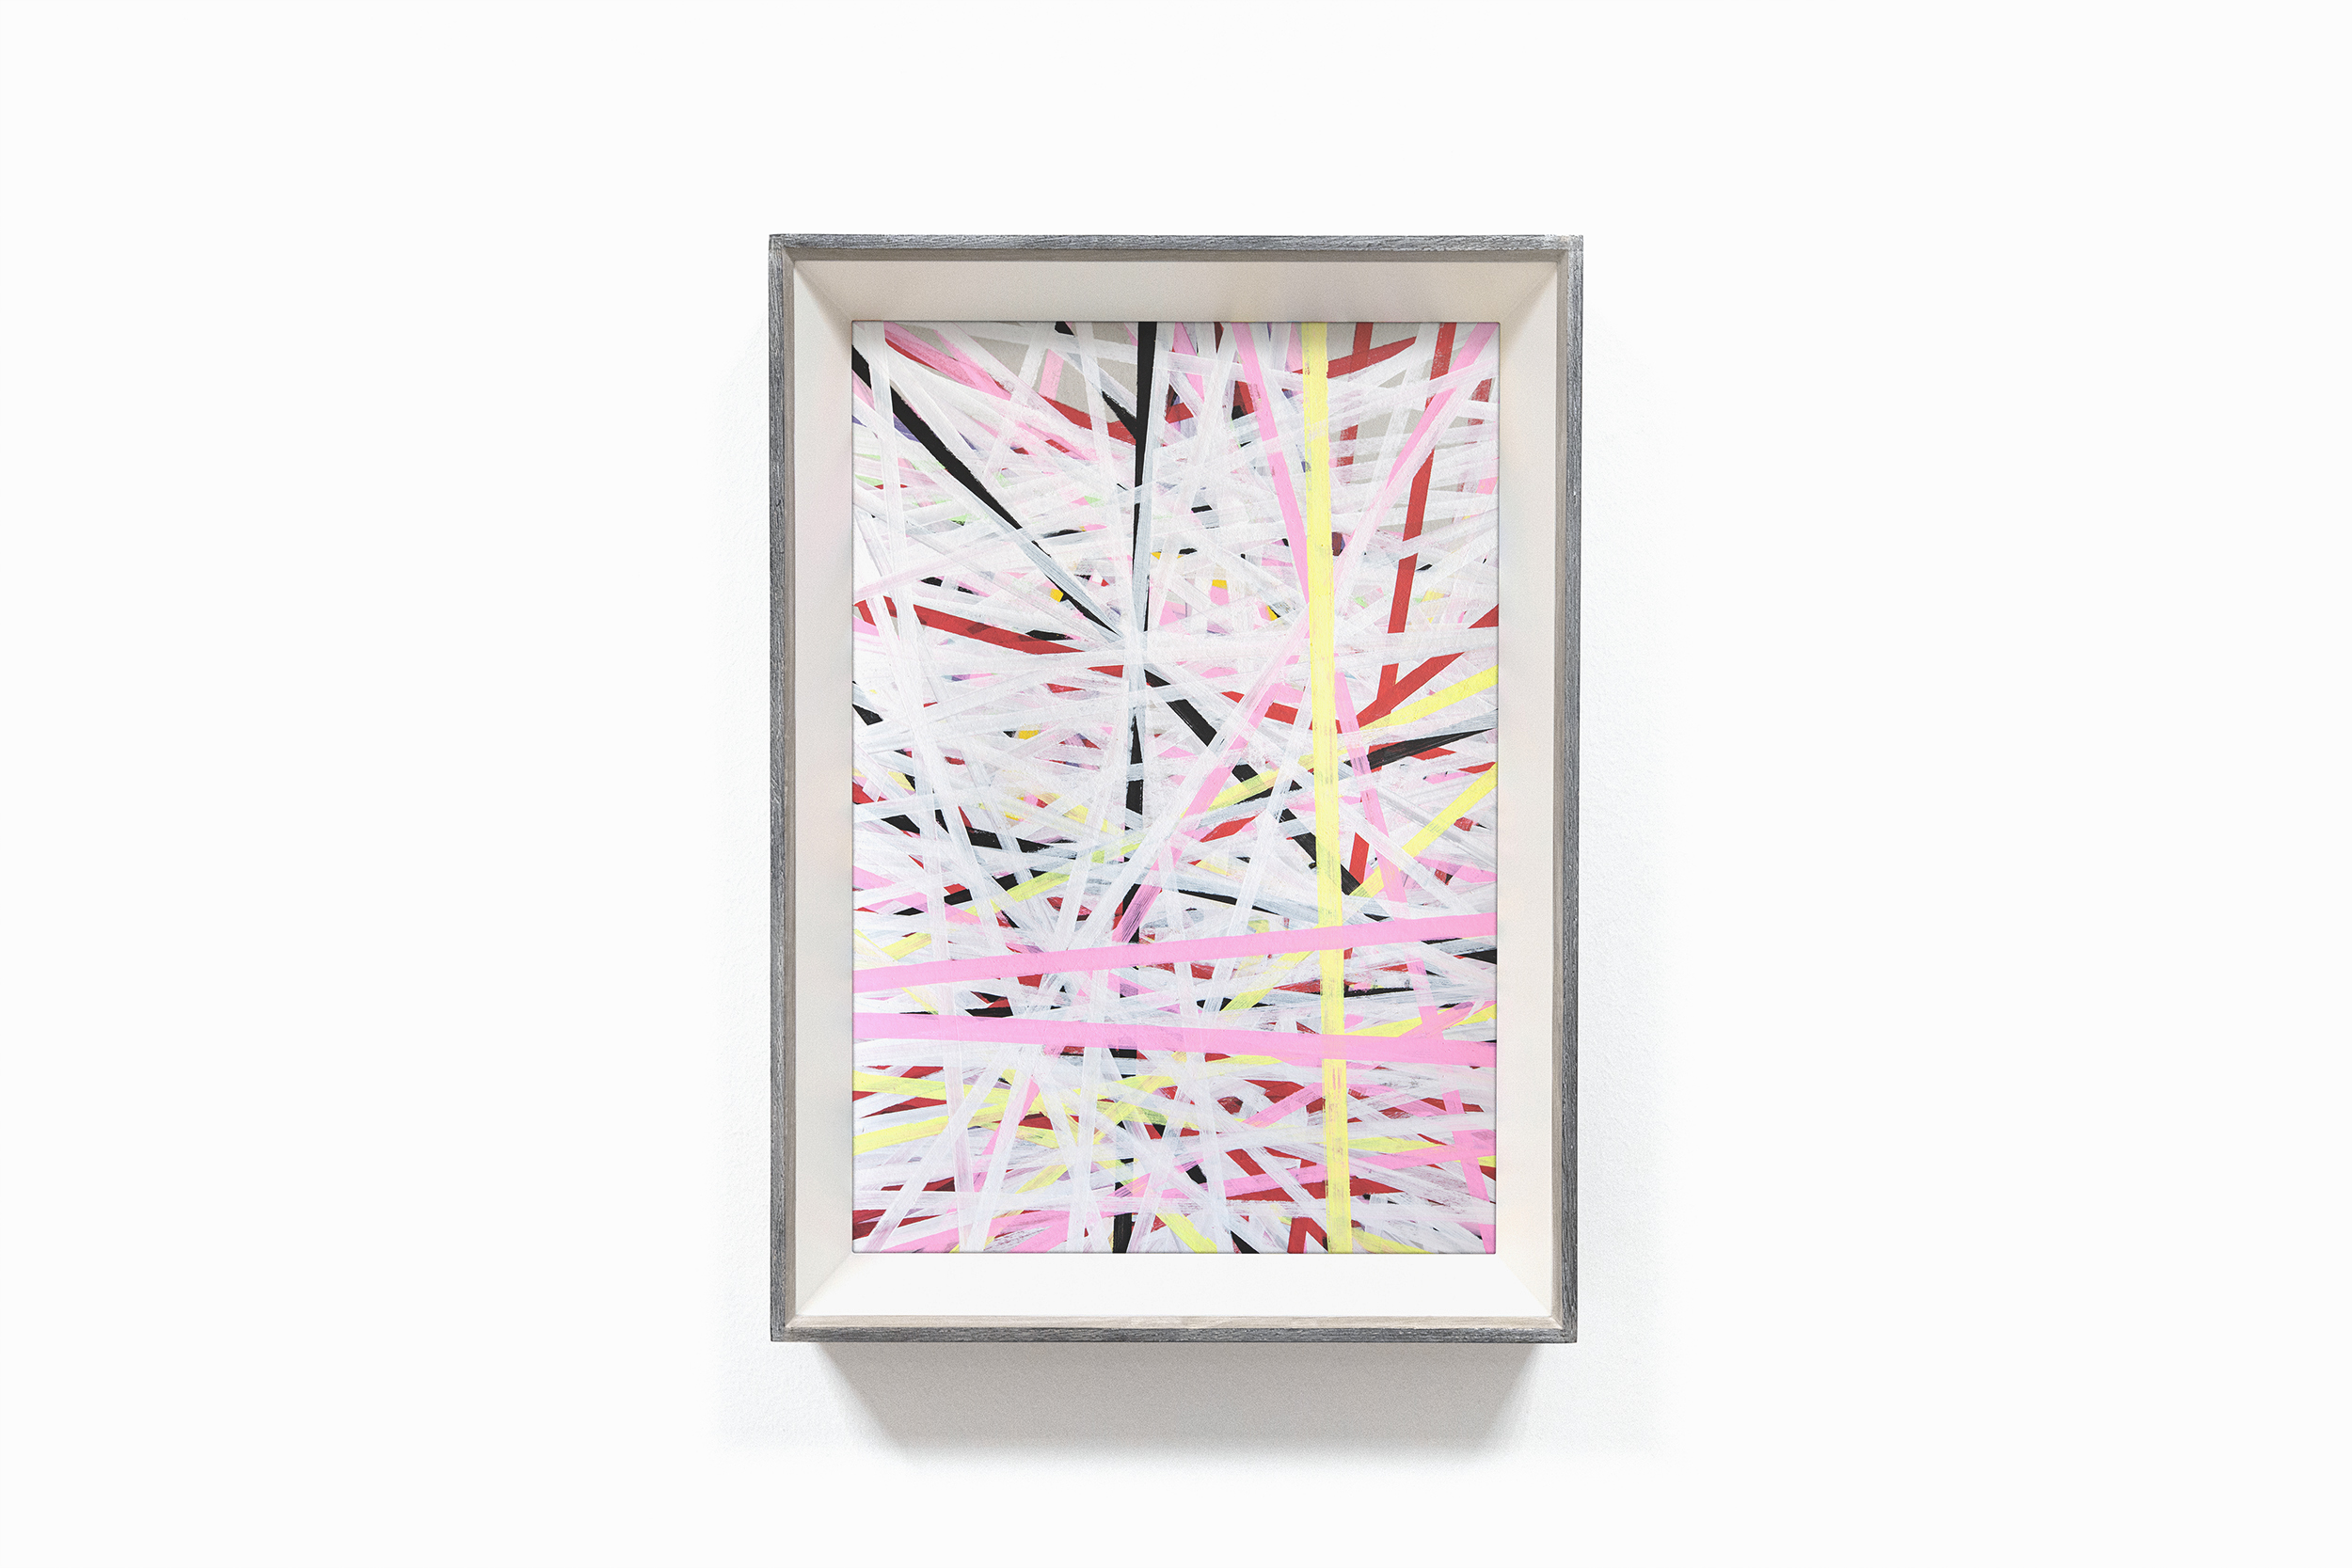 bonjourmolotov+Coming+soon+series+Illustration+Ilustracao+painting+pintura+acrylic+acrílico+canvas+tela+paper+cardboard+mdf+Andre+Gigante+03B.jpg